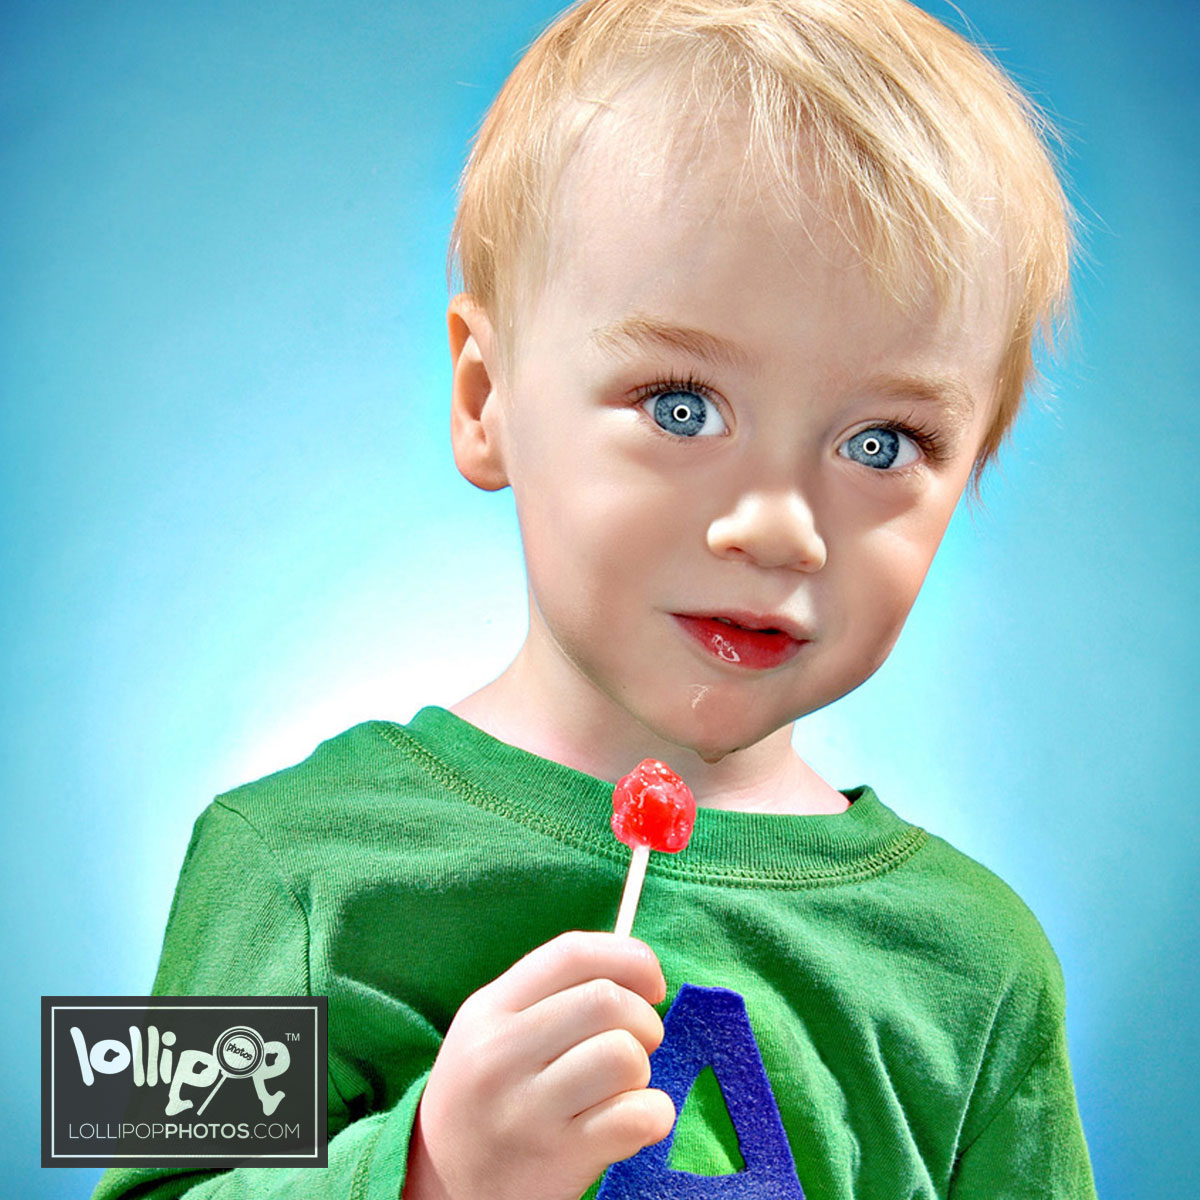 msdig-nora-canfield-lollipop-photos-457.jpg